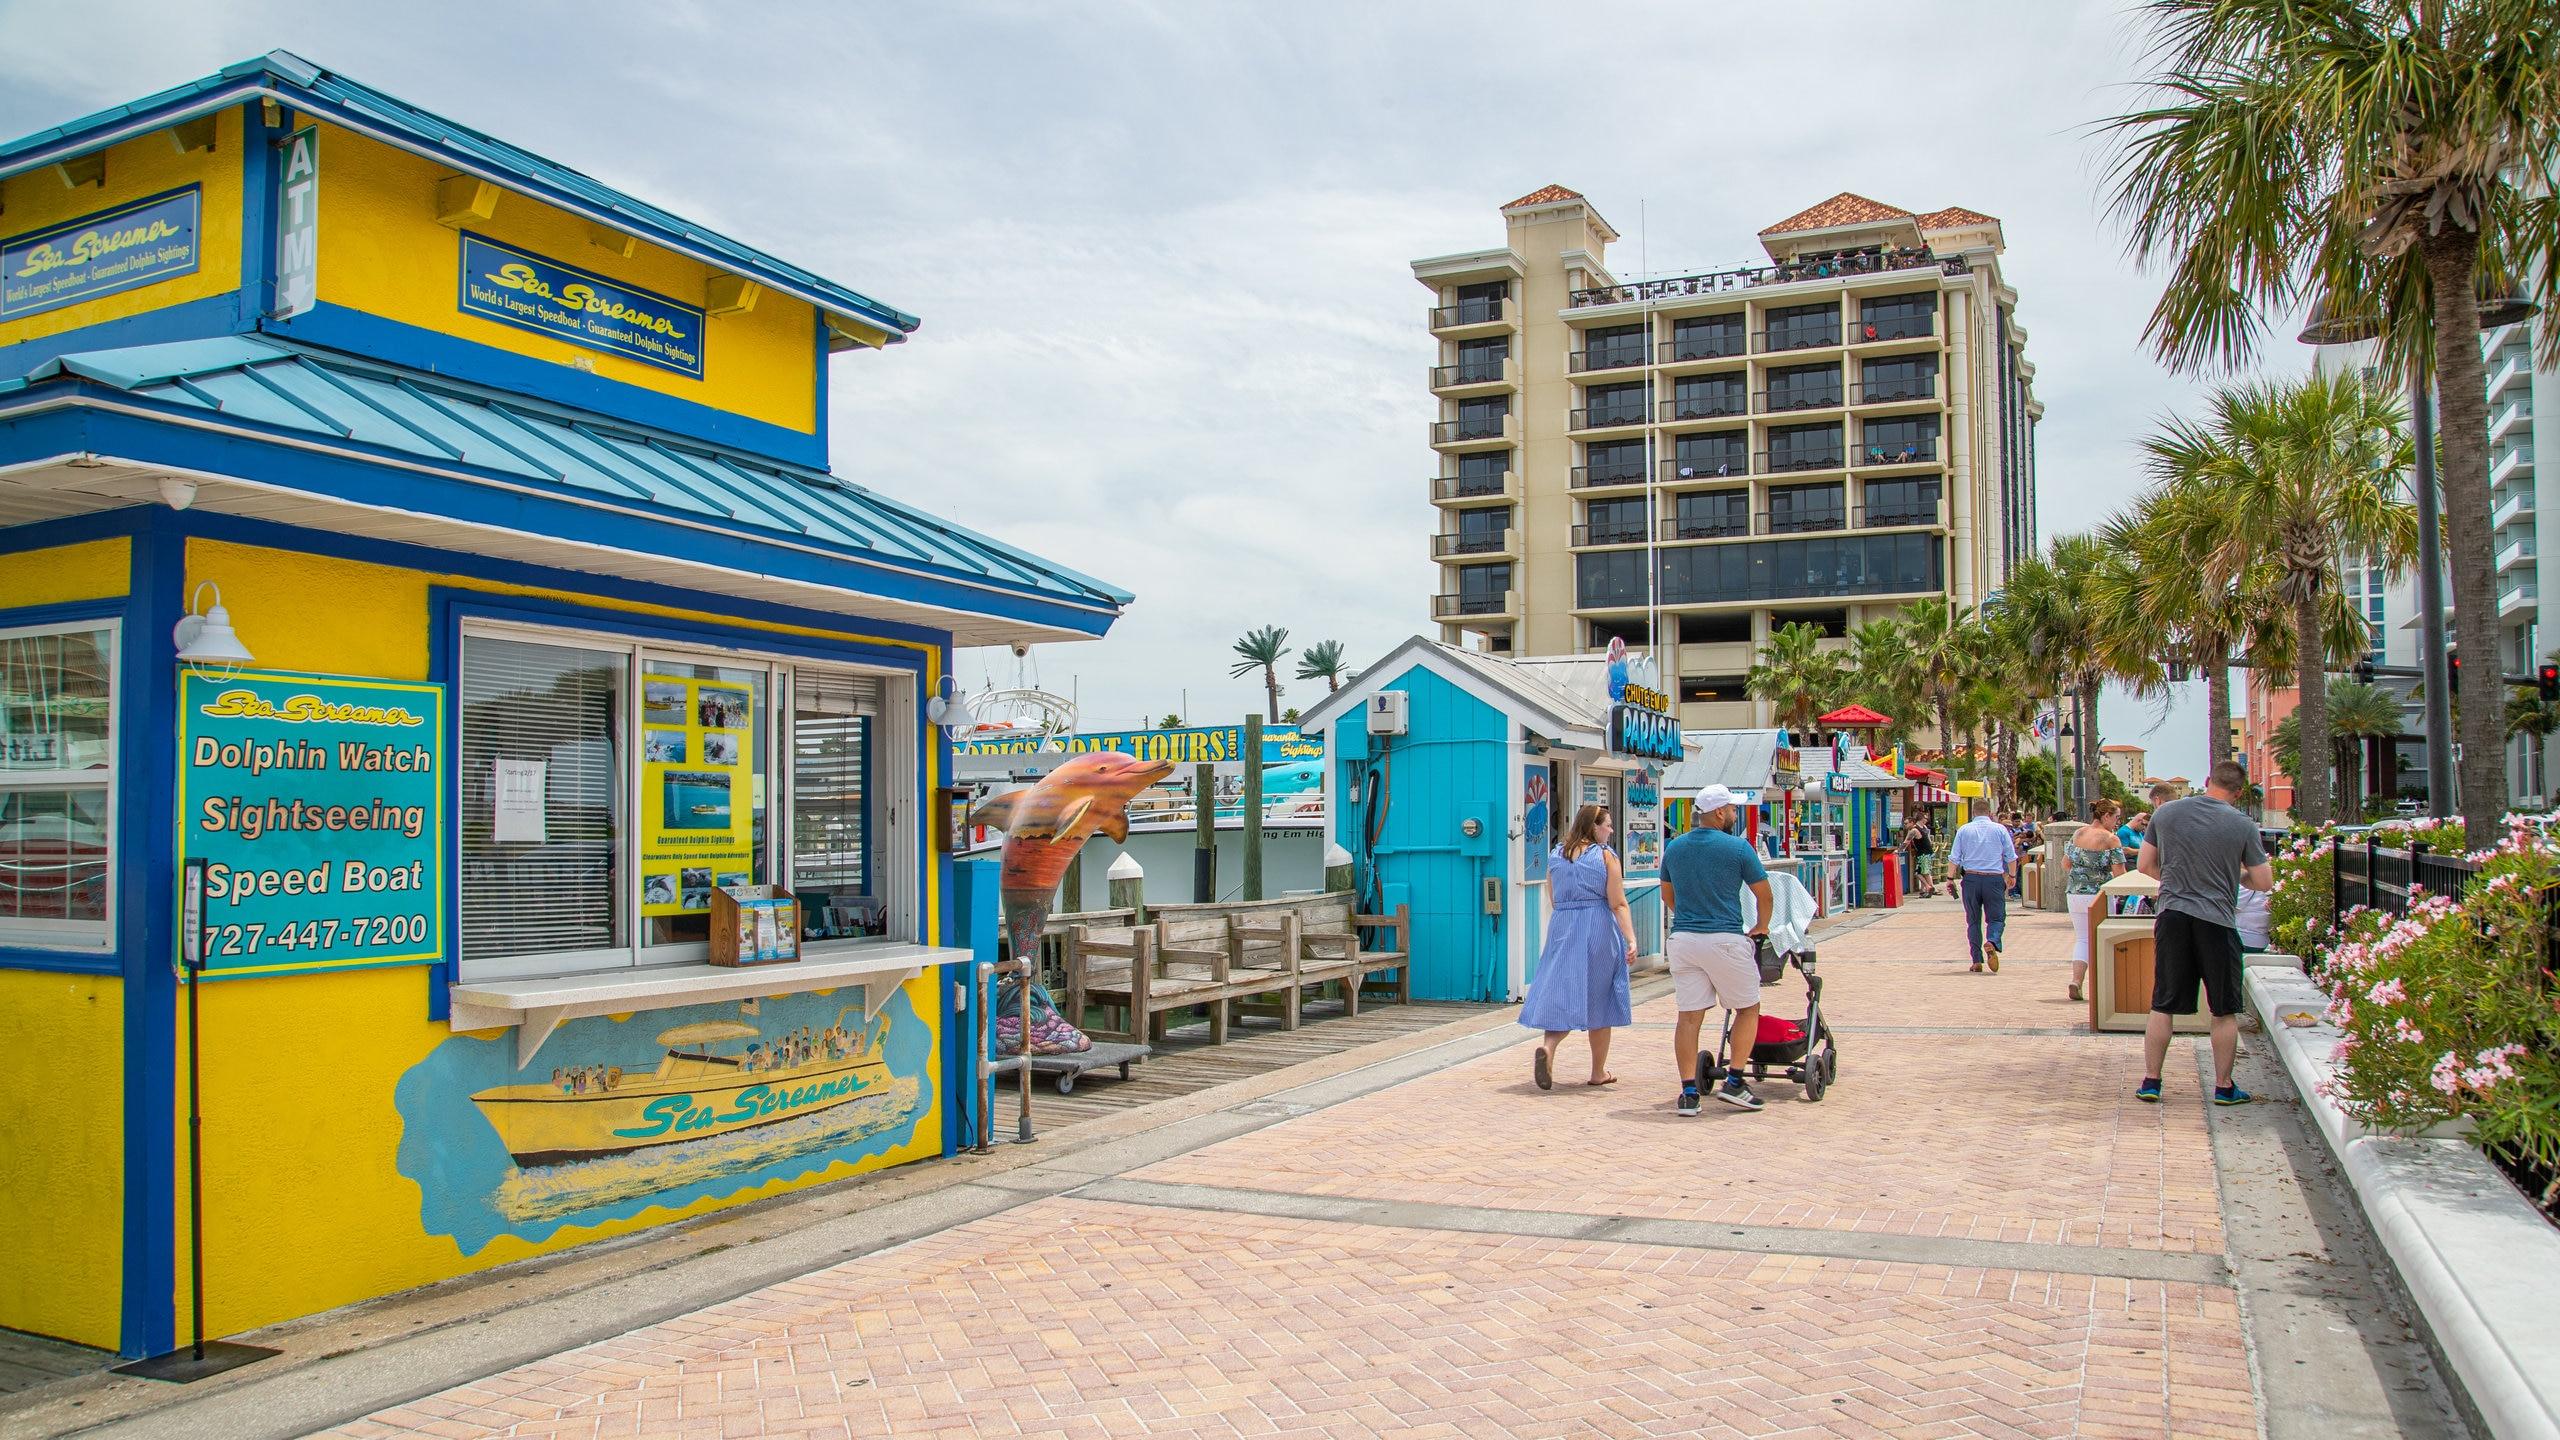 Clearwater Municipal Marina, Clearwater Beach, Florida, United States of America